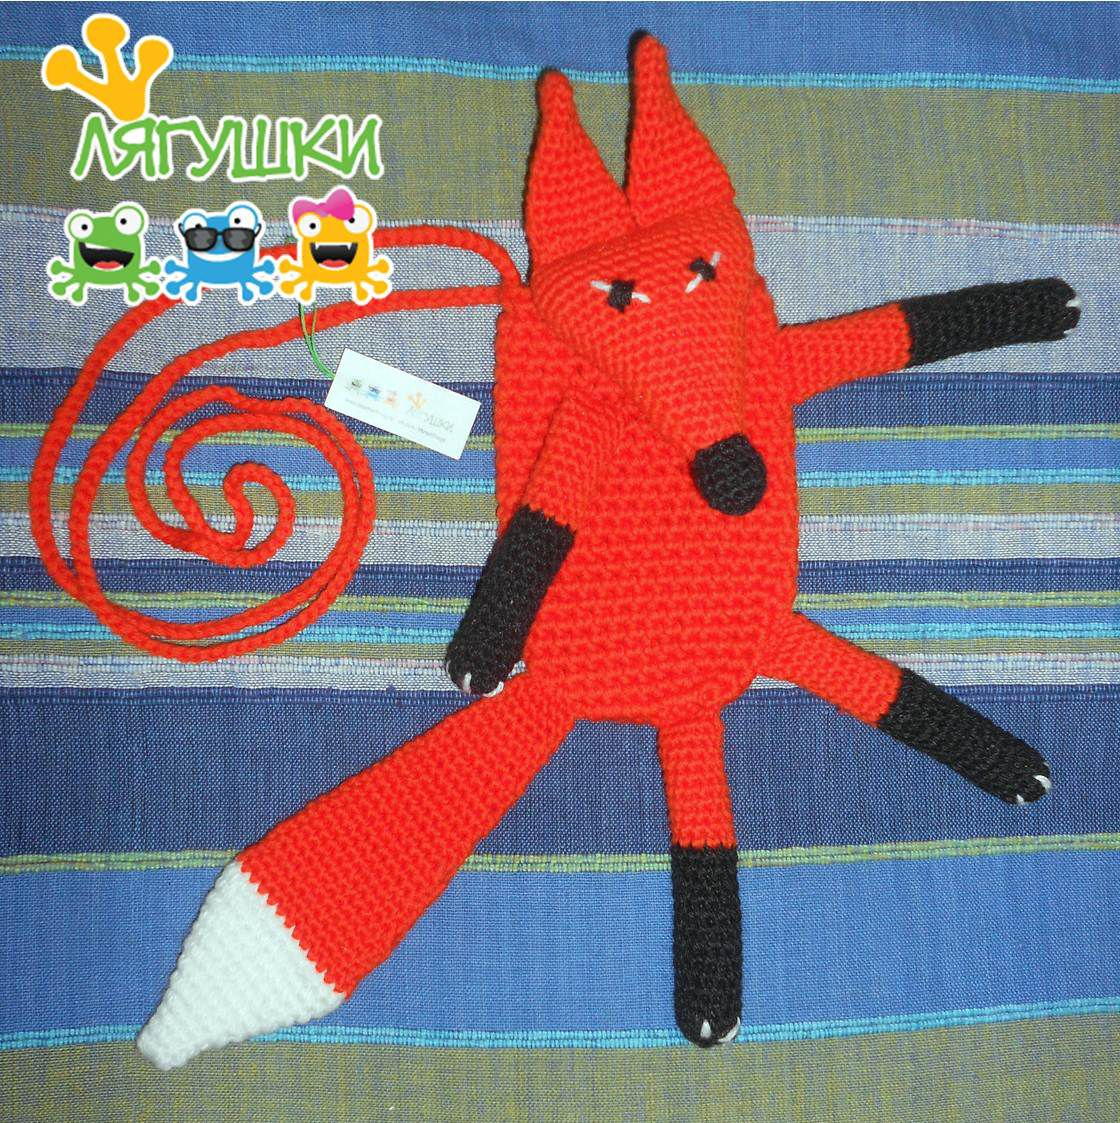 crochetbag smartphonebag лис лисички сумкалиса футлярдлясмартфона слисойнапрогулку brownfox excellentgift трилягушки вязанаясумка фырфыр fox redfox лиса